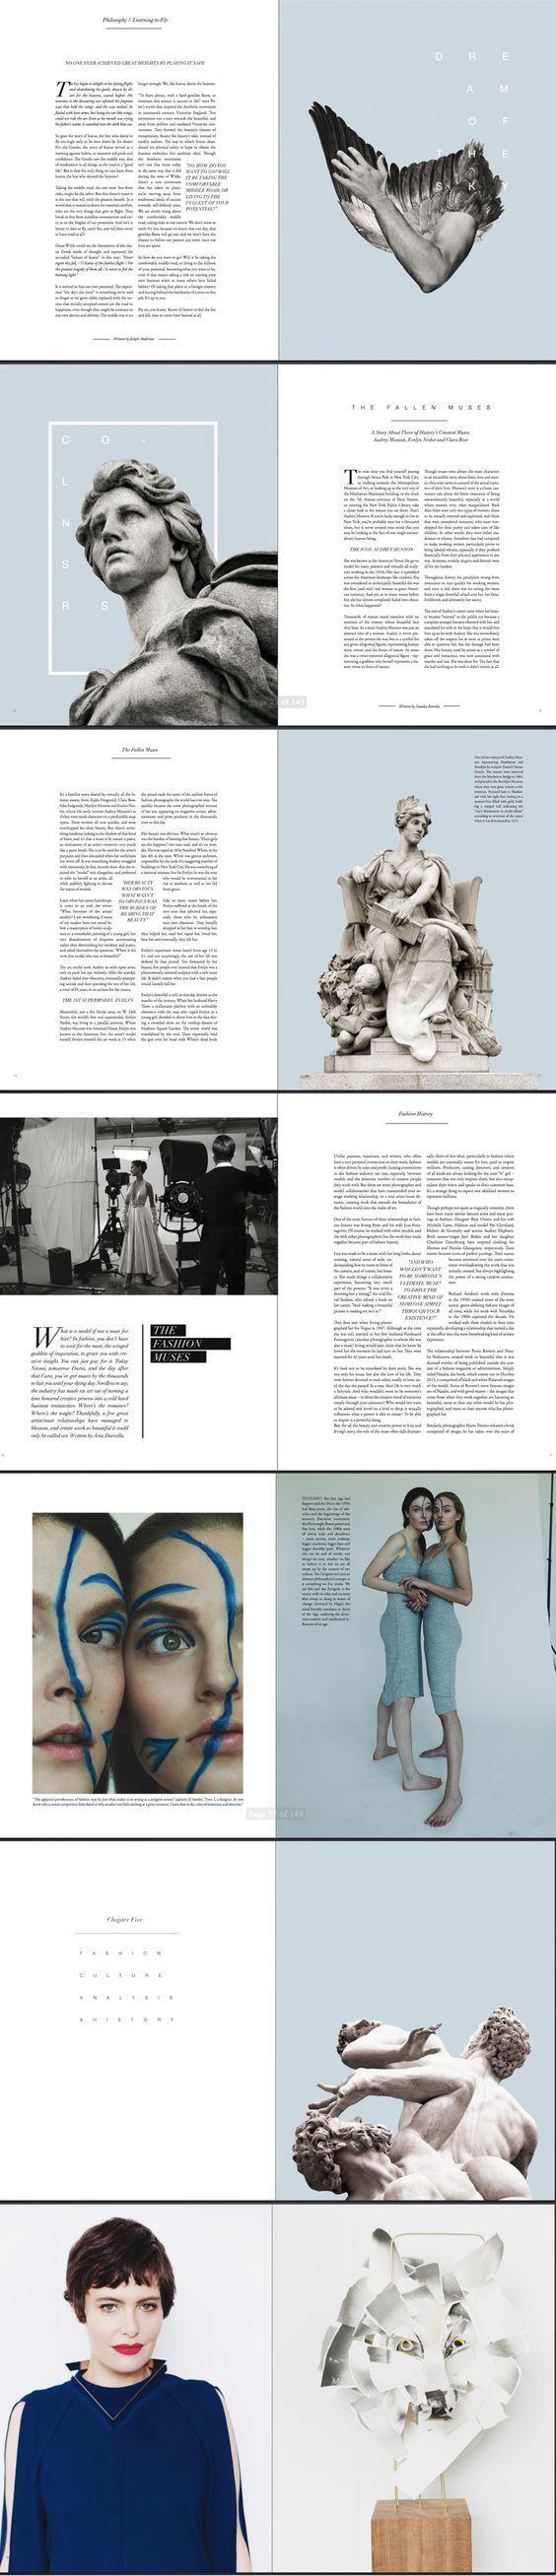 Lone Wolf Magazine, Volume 12 Layout Design | Graphic Design | Magazine Layout: